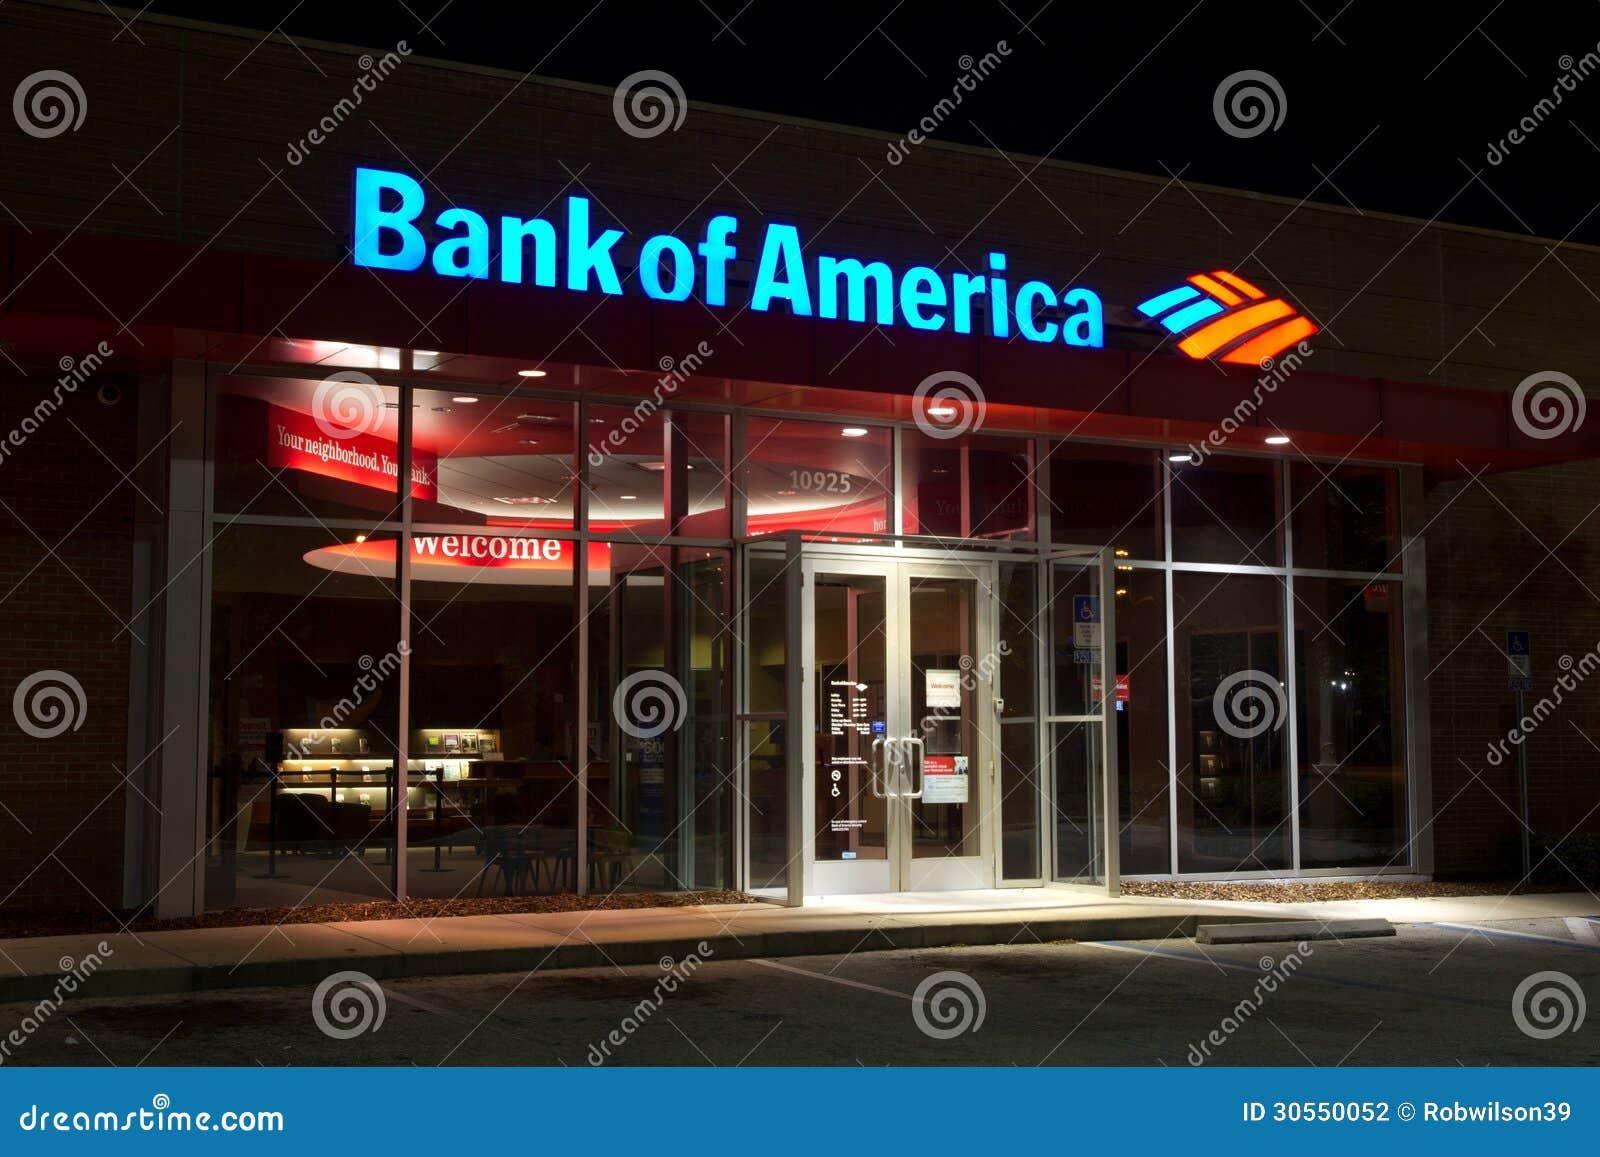 bank collapse royalty free cartoon 78134363. Black Bedroom Furniture Sets. Home Design Ideas